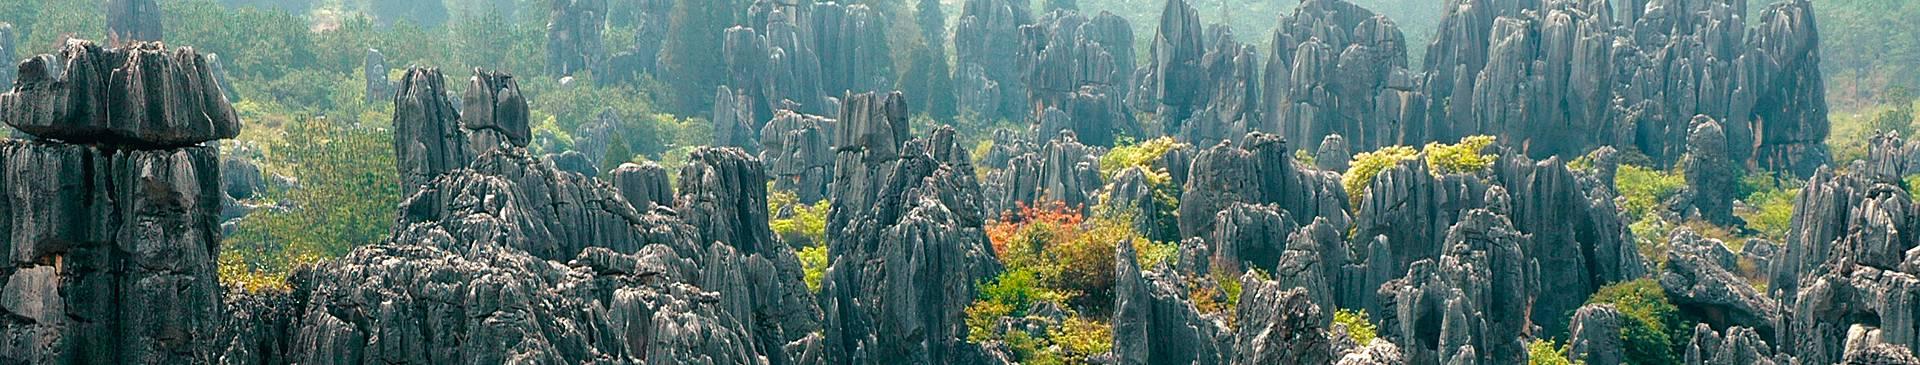 Voyage nature en Chine